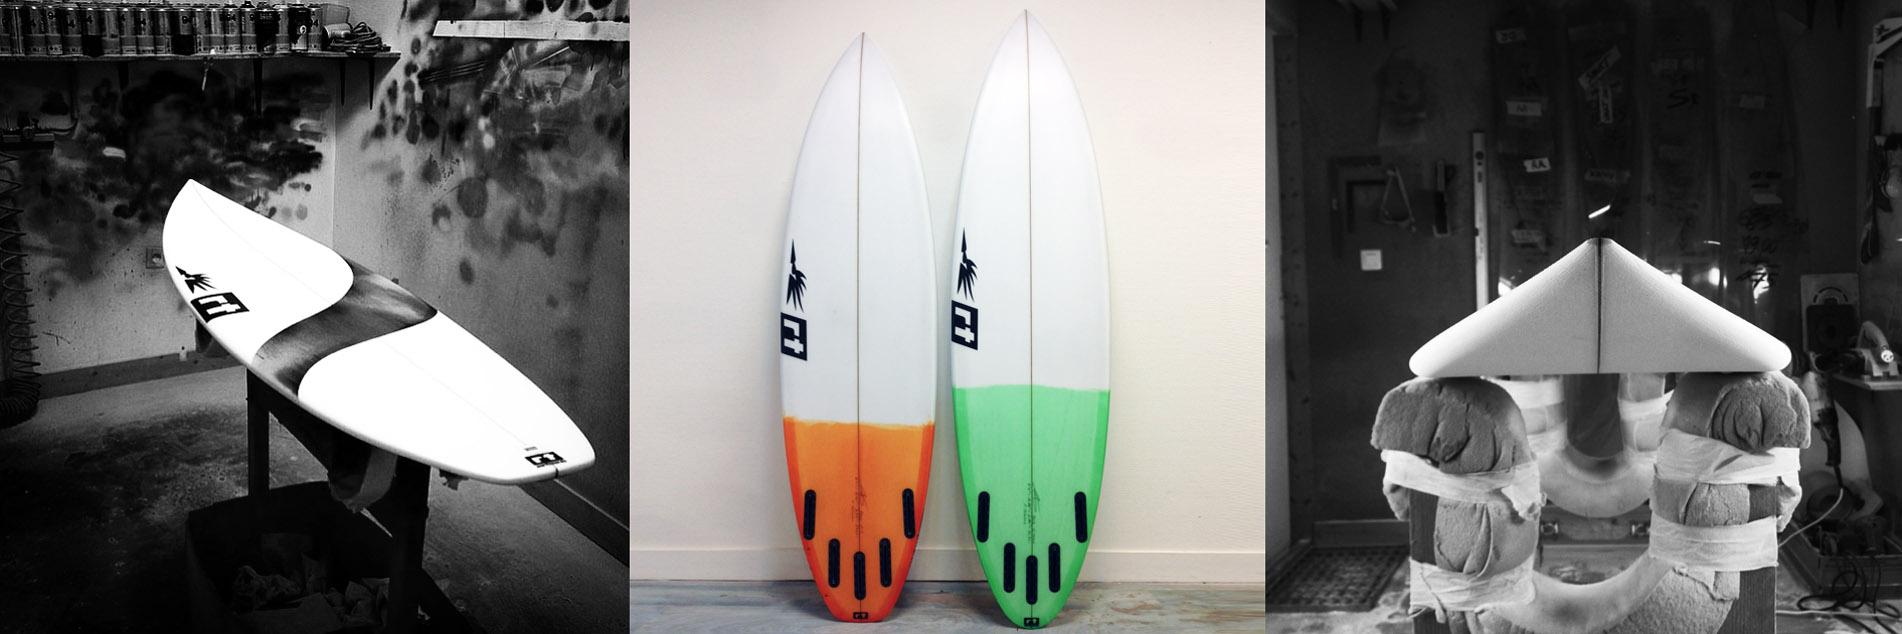 RTSurfboards_c3-04